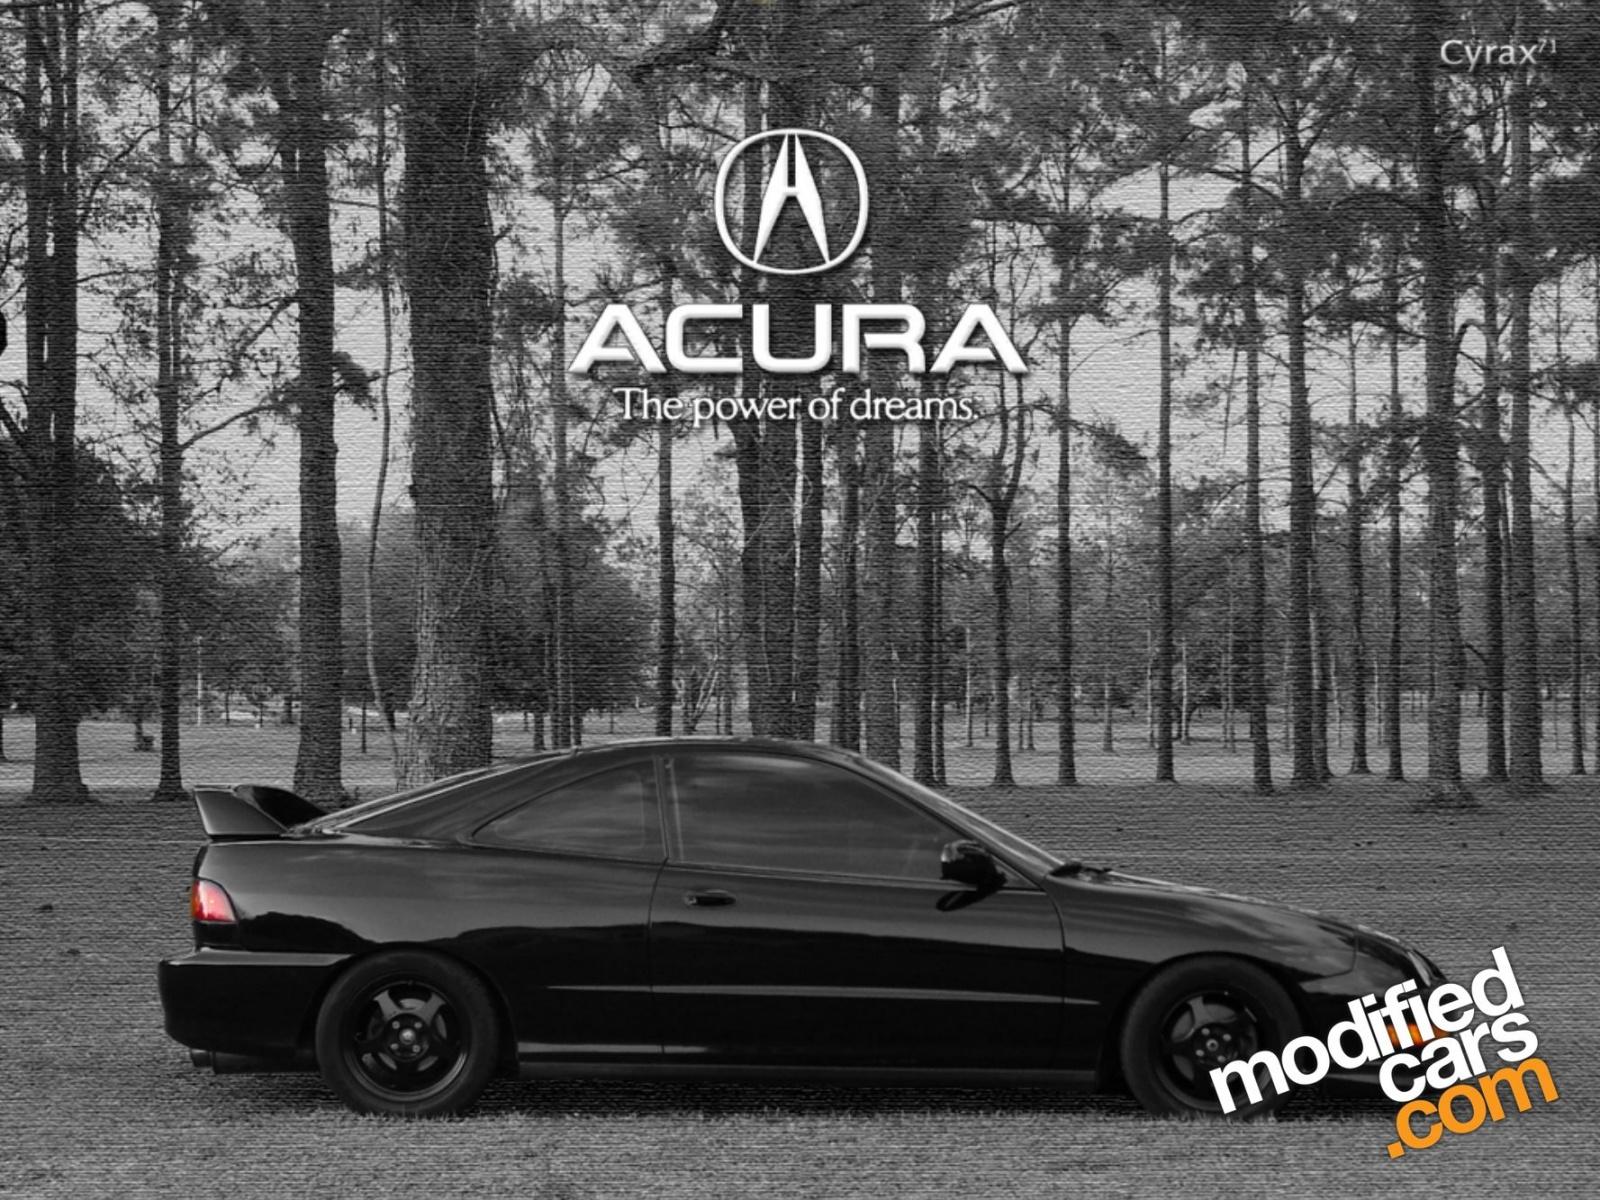 Jdm Acura Tsx Wallpaper 128 - Likegrass com